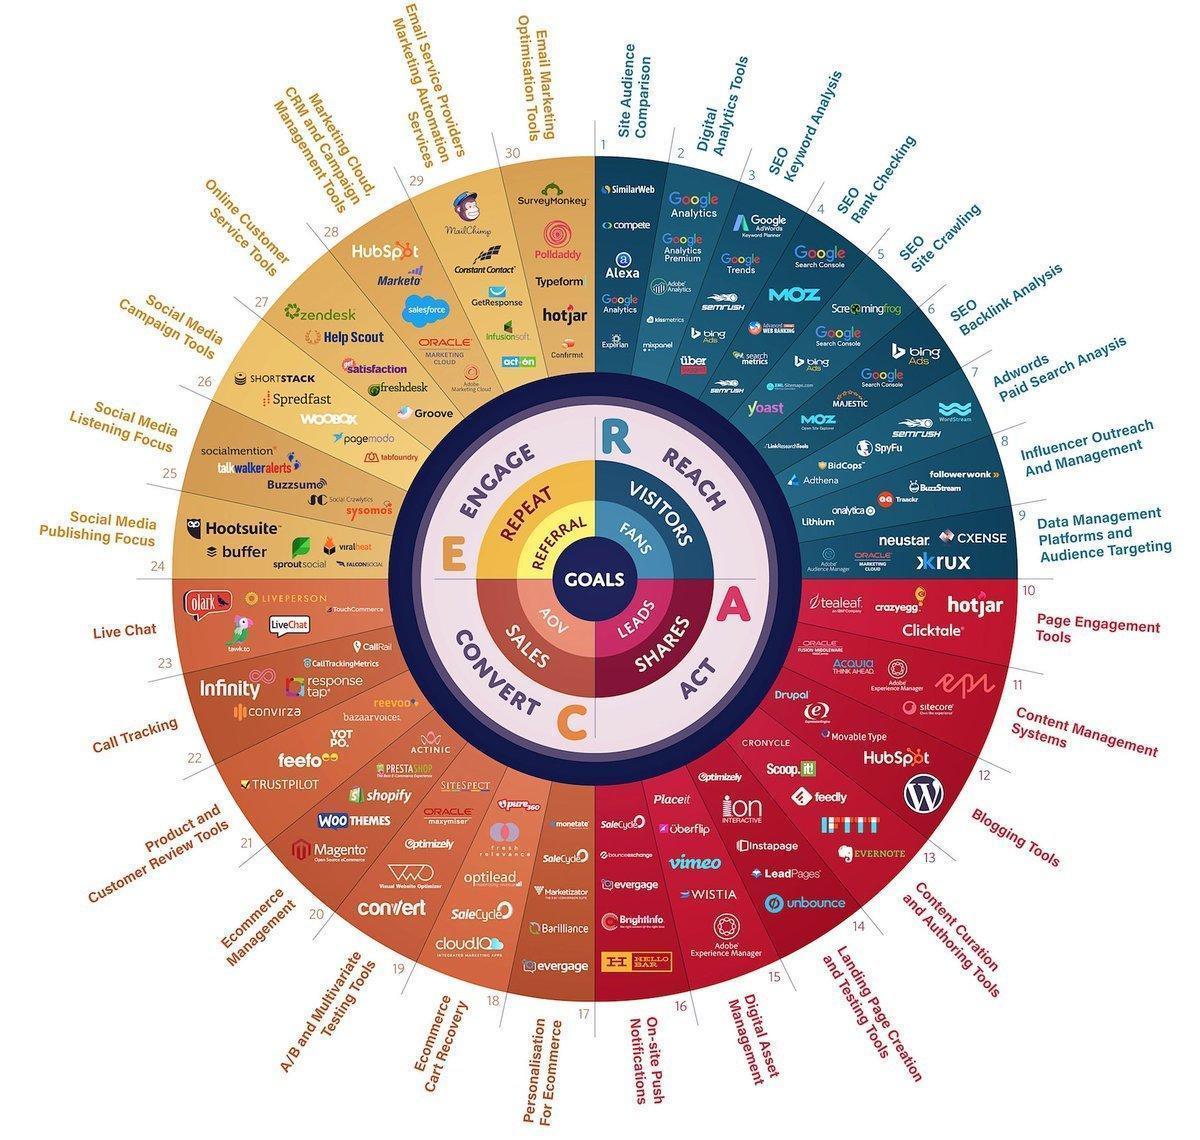 150 Digital Marketing Tools